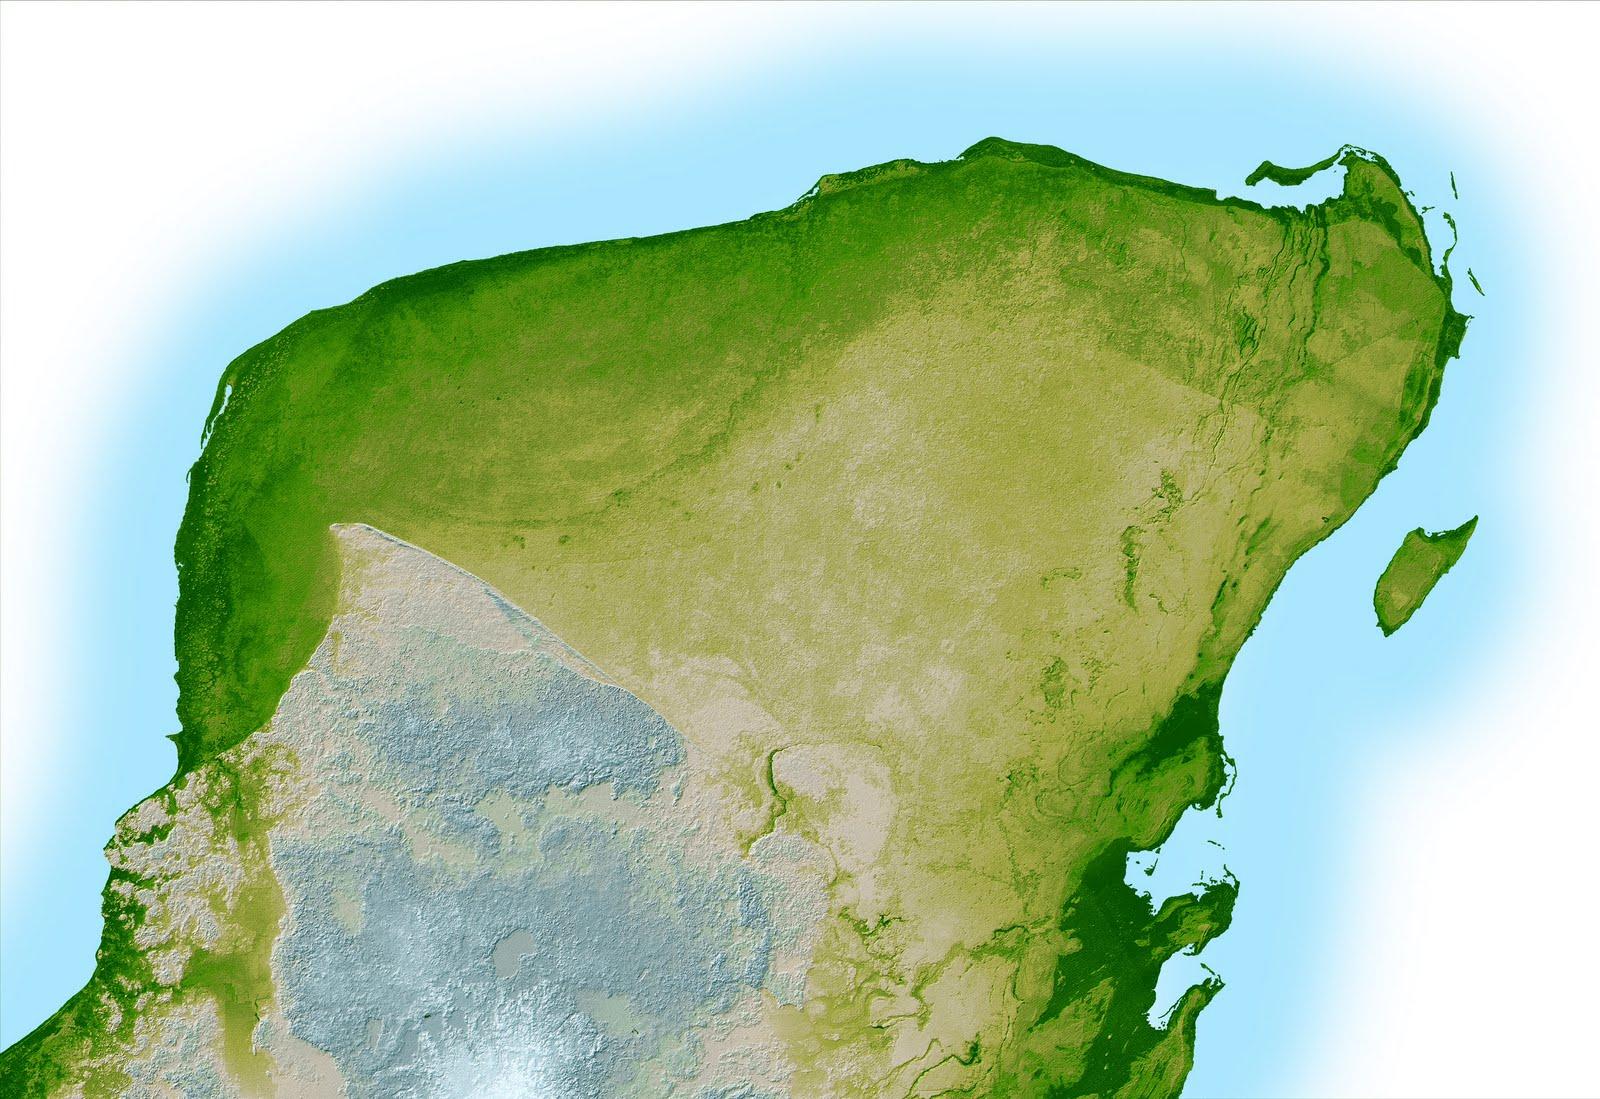 vegetacion de la peninsula de yucatan: